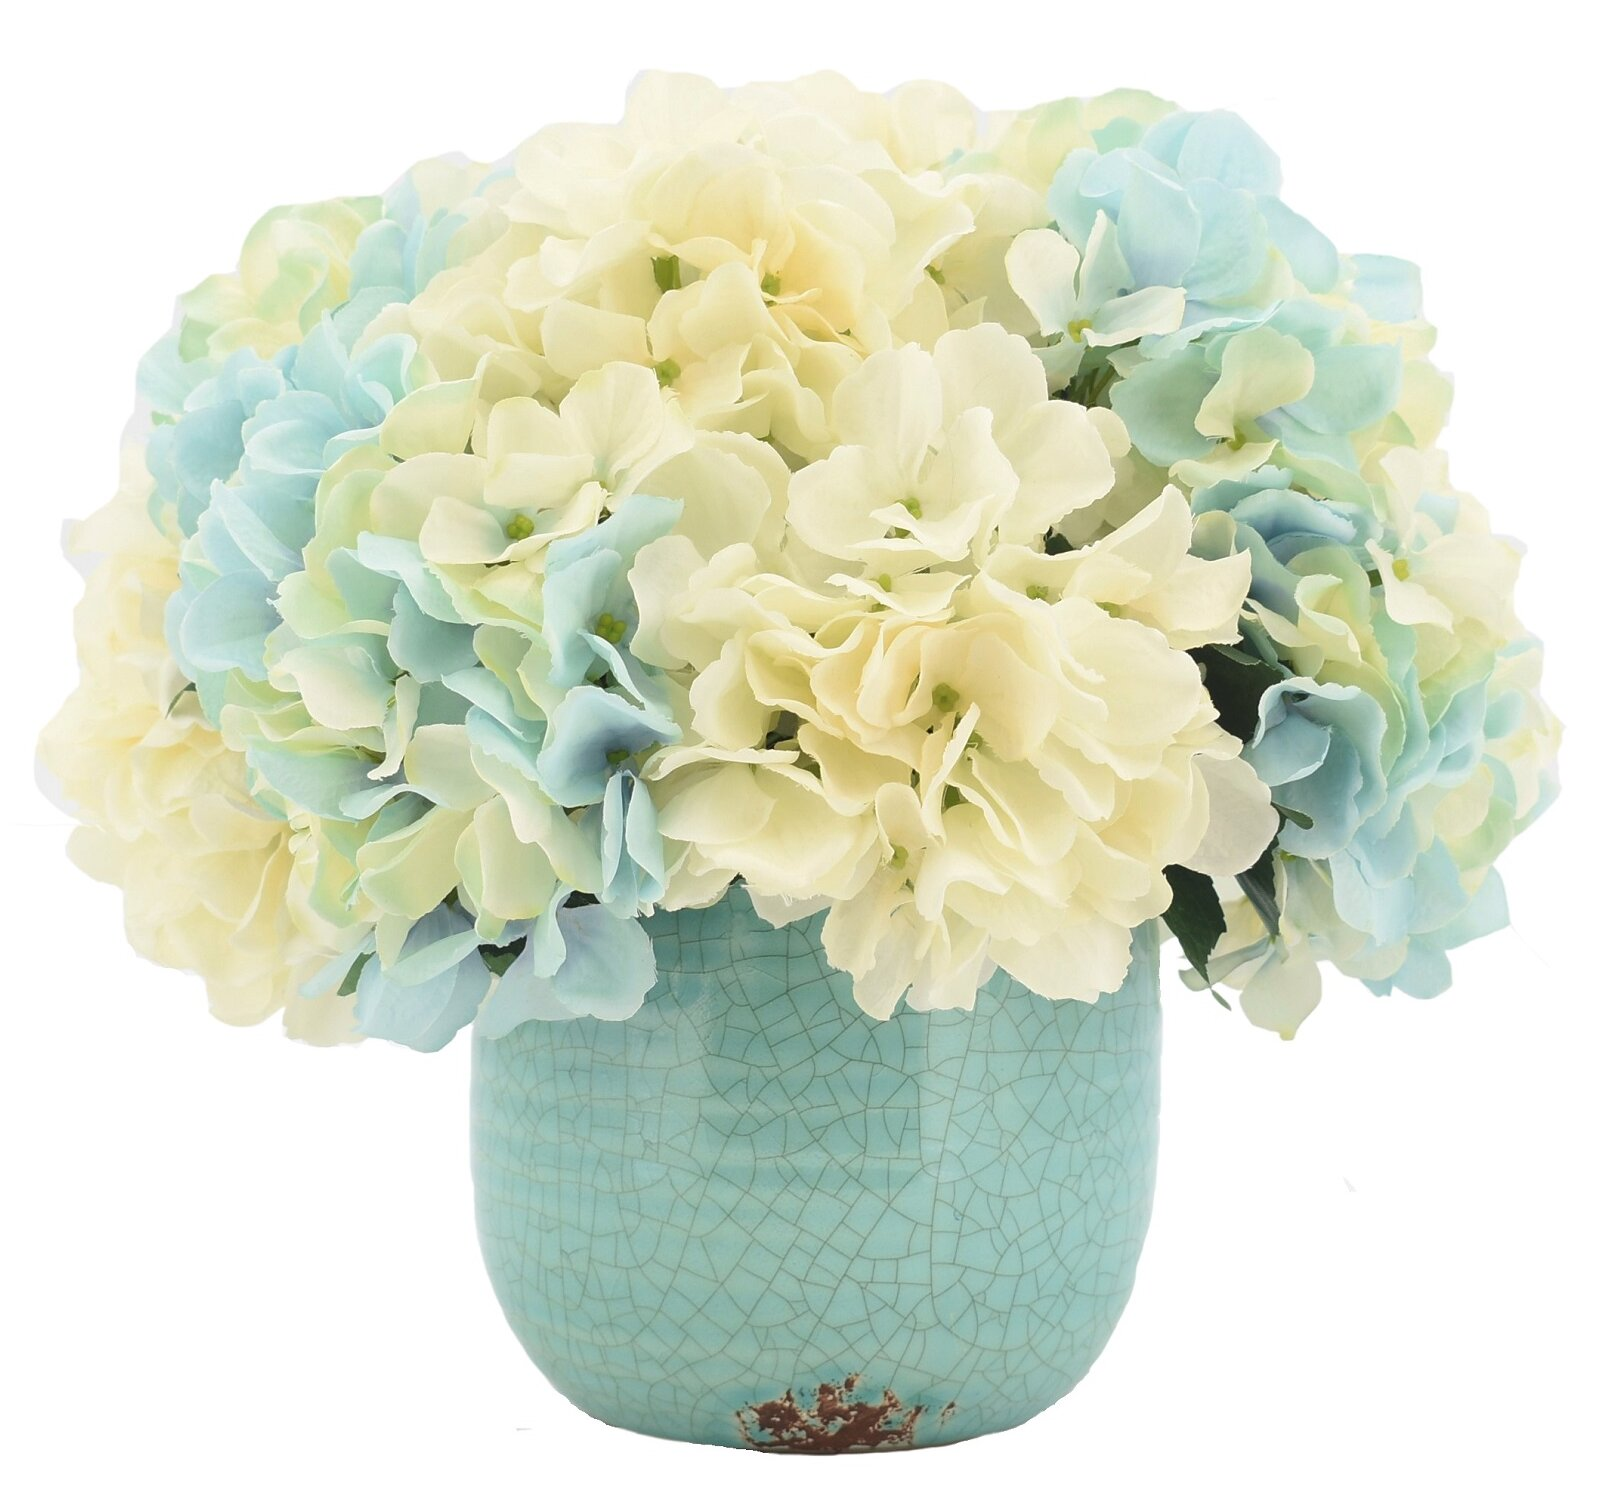 Rosecliff Heights Hydrangeas Floral Arrangements And Centerpieces In Pot Reviews Wayfair